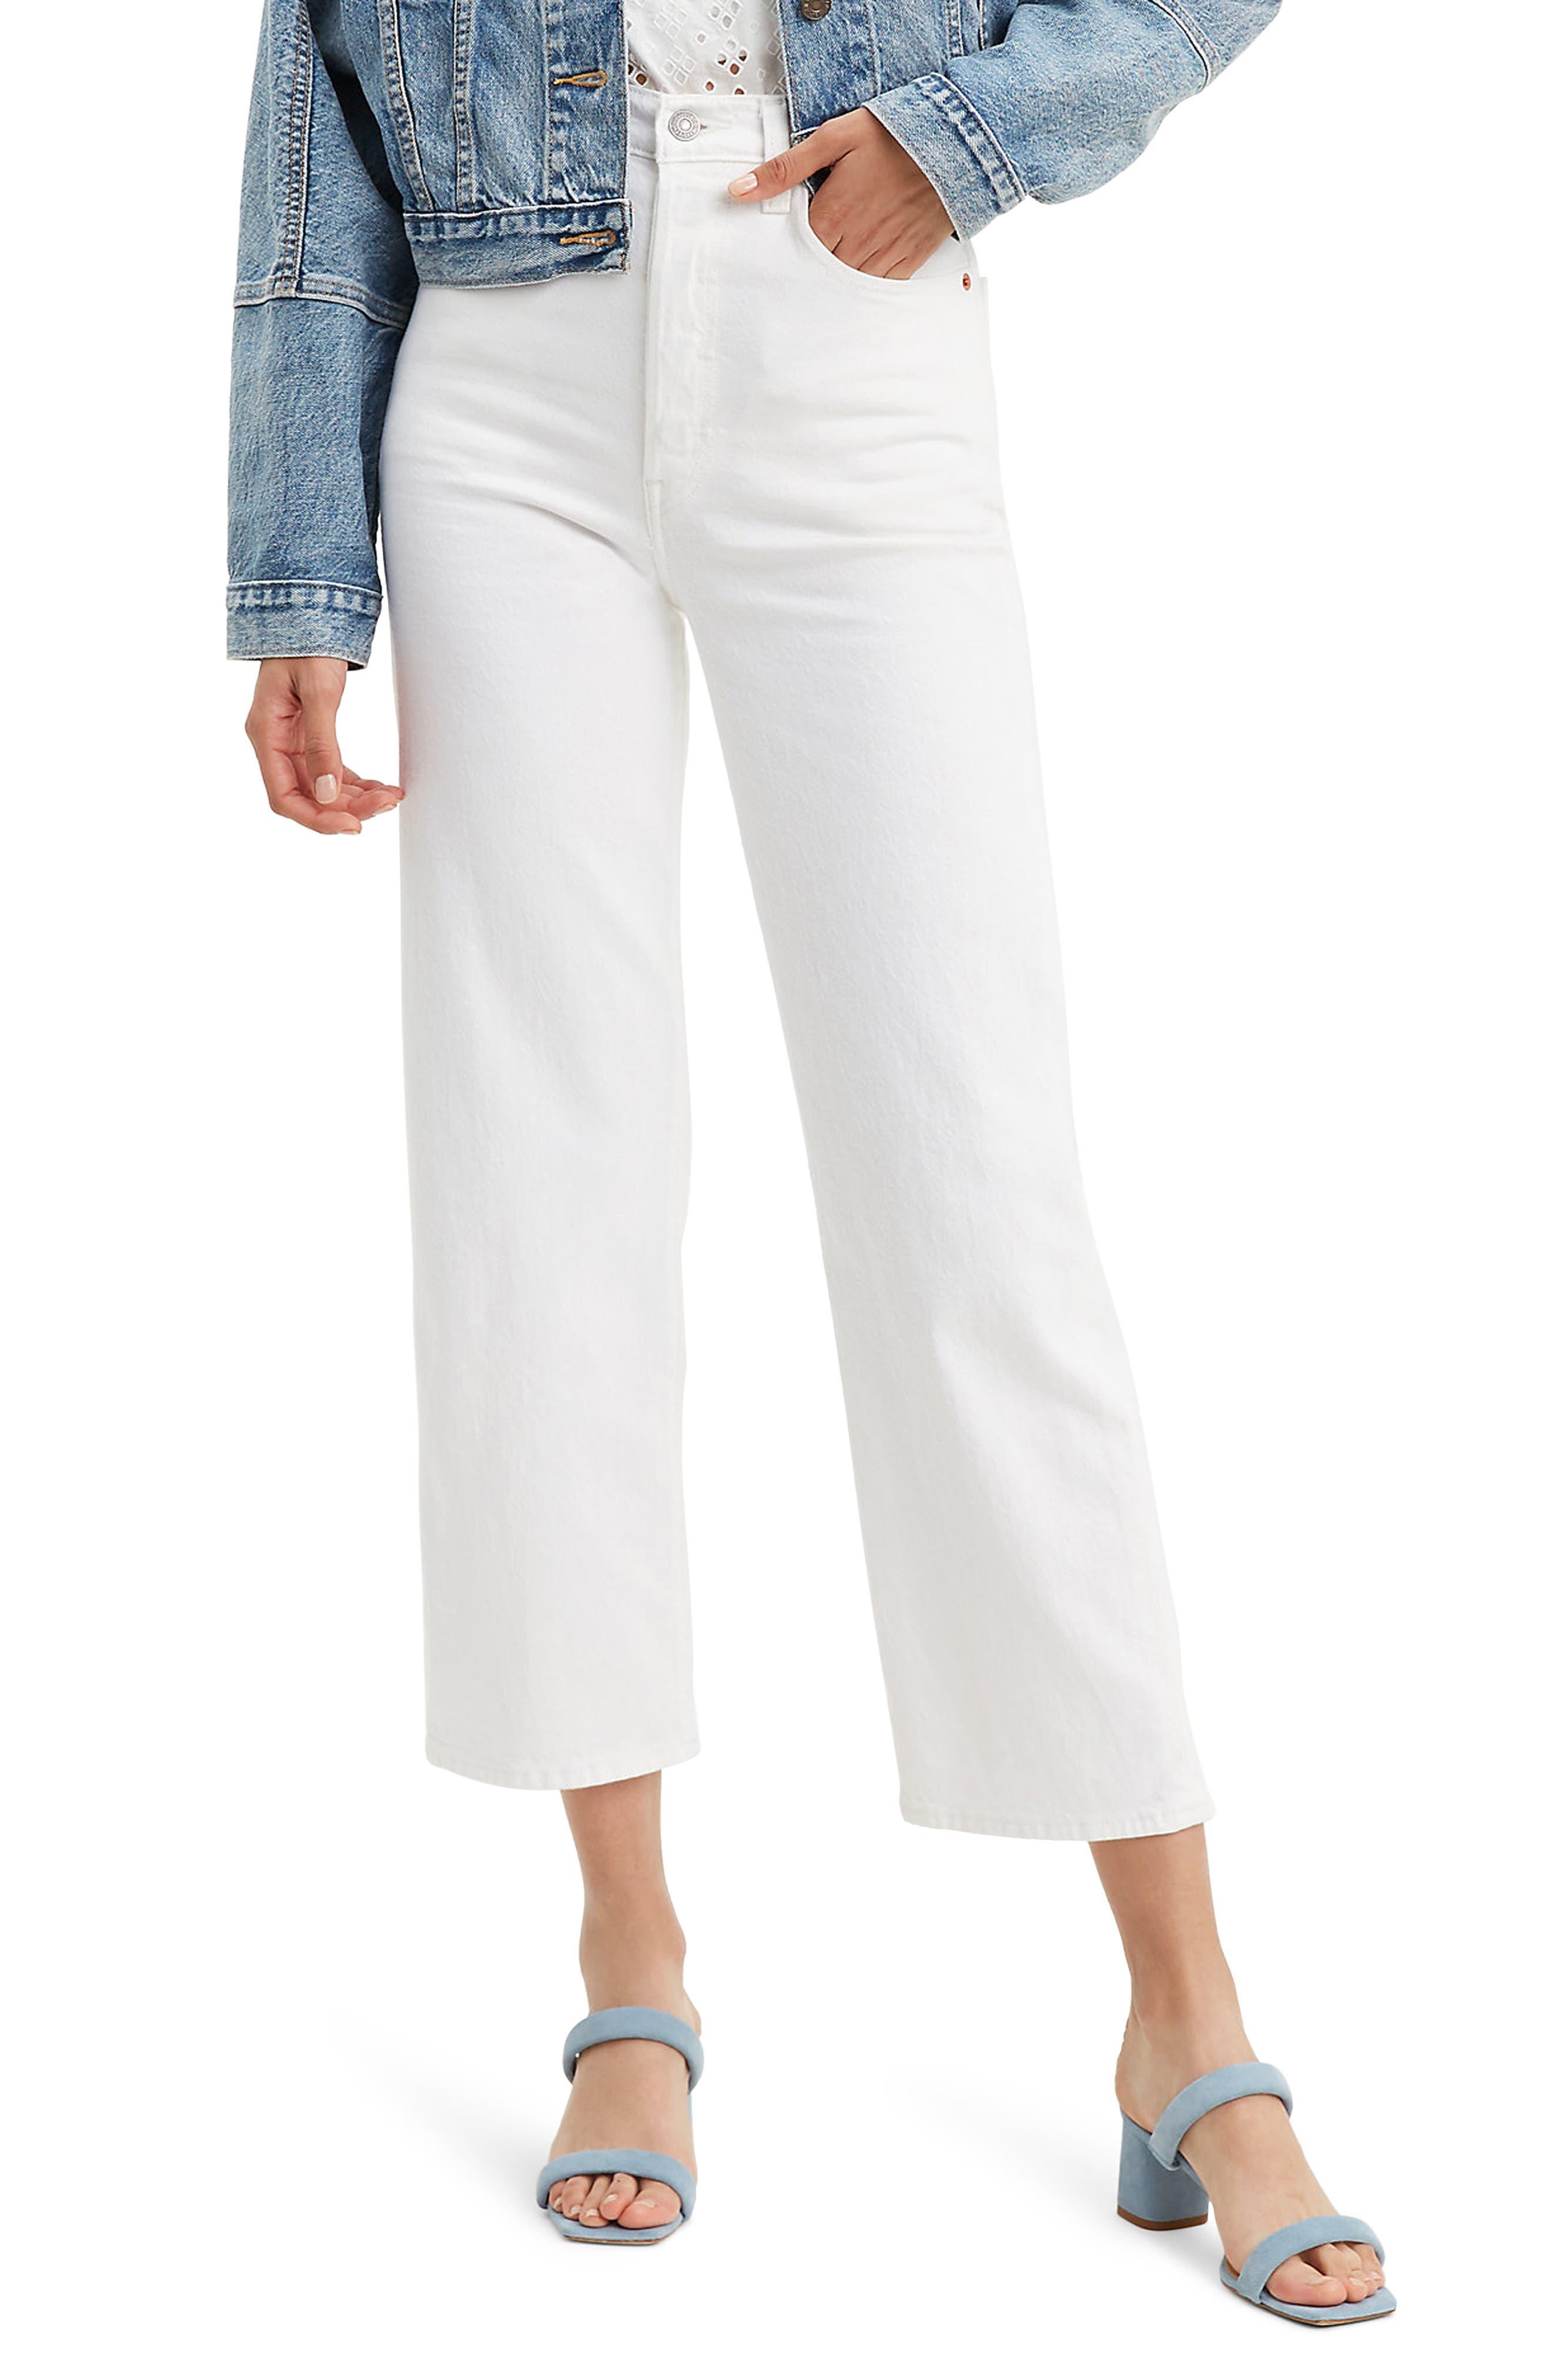 Women's Levi's Ribcage High Waist Ankle Straight Leg Jeans,  32 x 27 - White